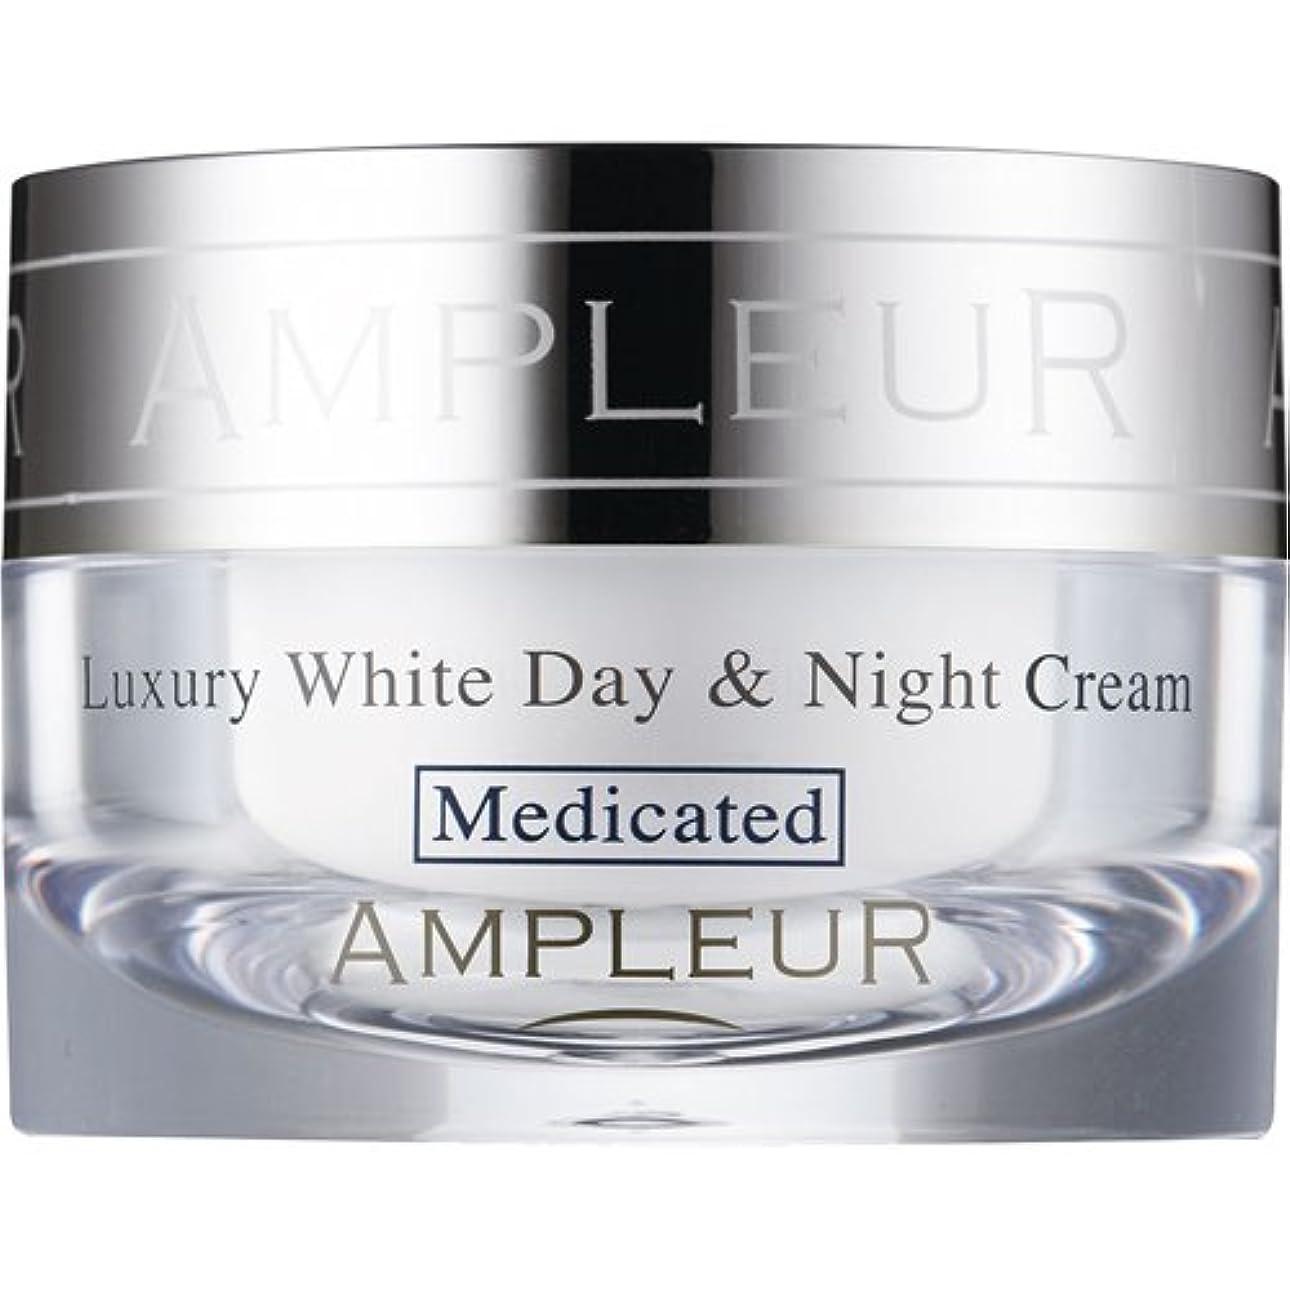 AMPLEUR(アンプルール) ラグジュアリーホワイト 薬用デイ&ナイトクリーム 30g